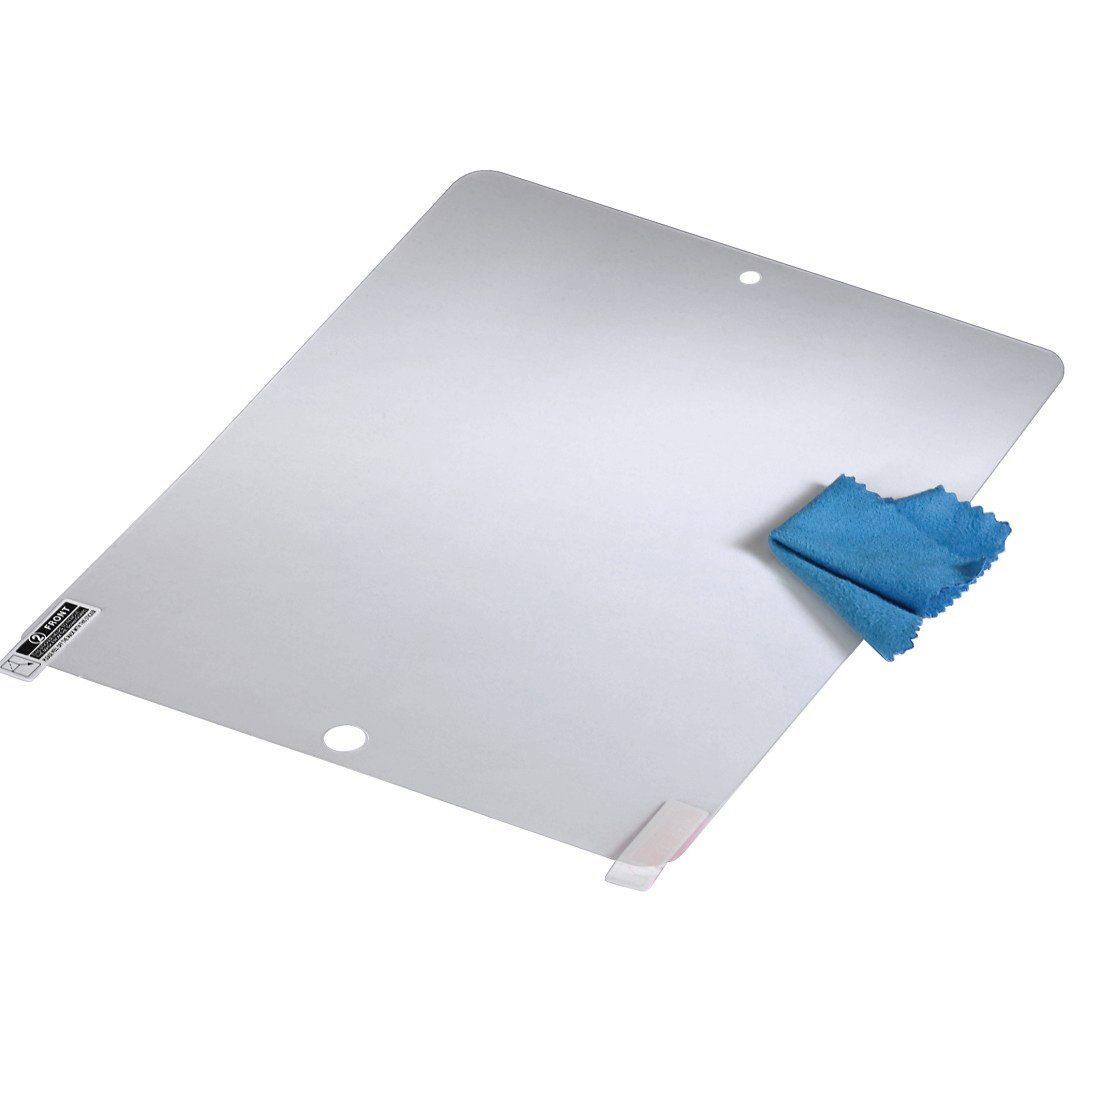 Hama Displayschutzfolie Anti-reflective für Apple iPad Air/Air 2/Pro